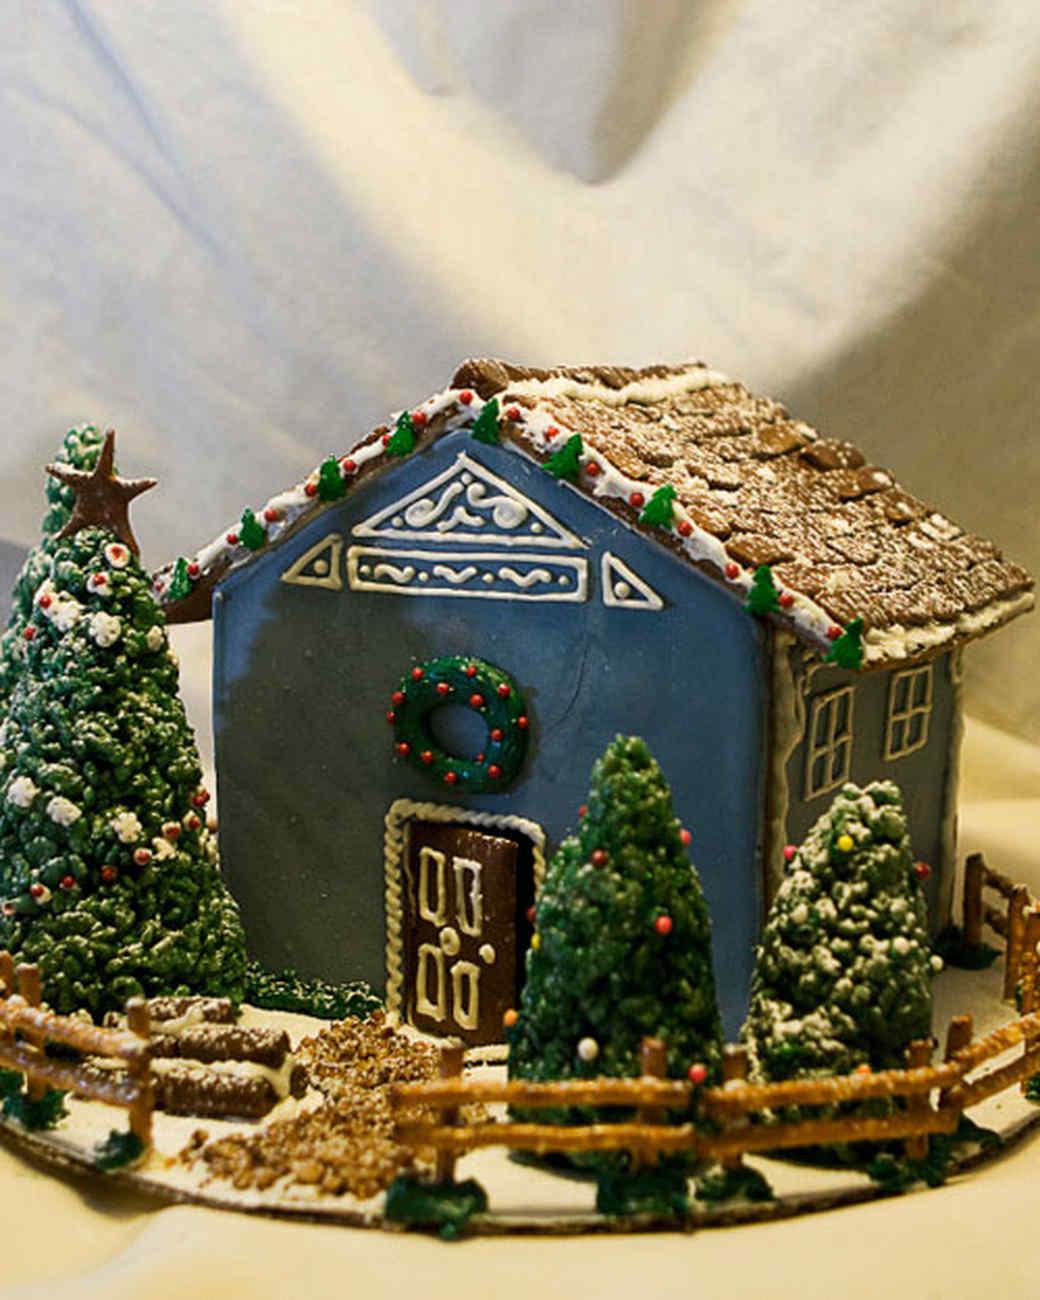 School Office Decor Christmas Gingerbread House Door: Your Best Gingerbread Houses